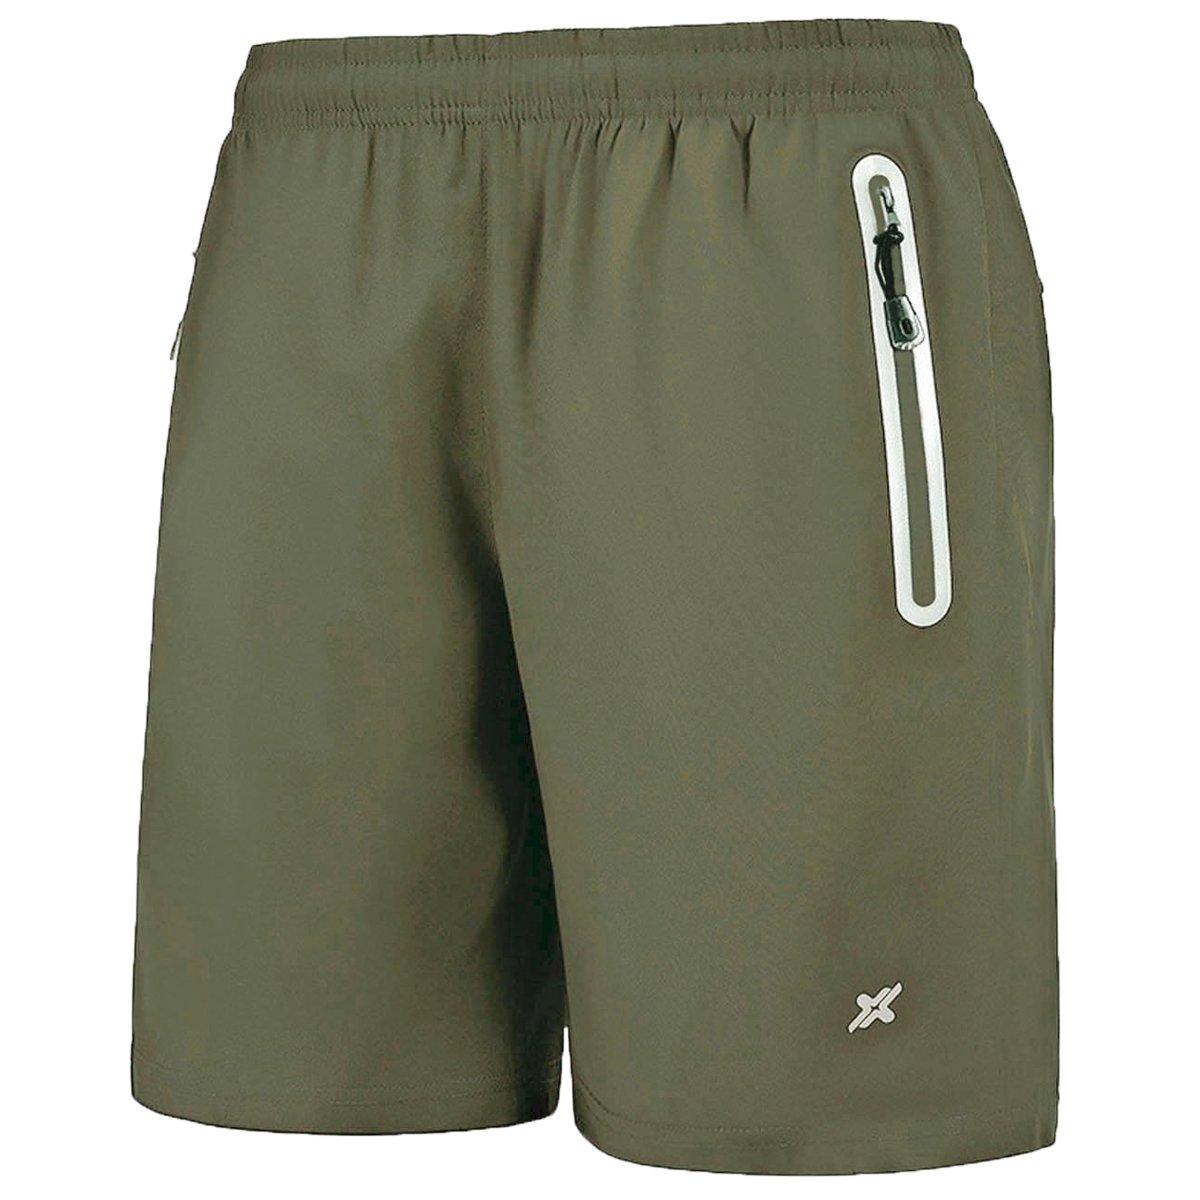 donhobo SHORTS メンズ B075N7S5XR S|01army Green 01army Green S